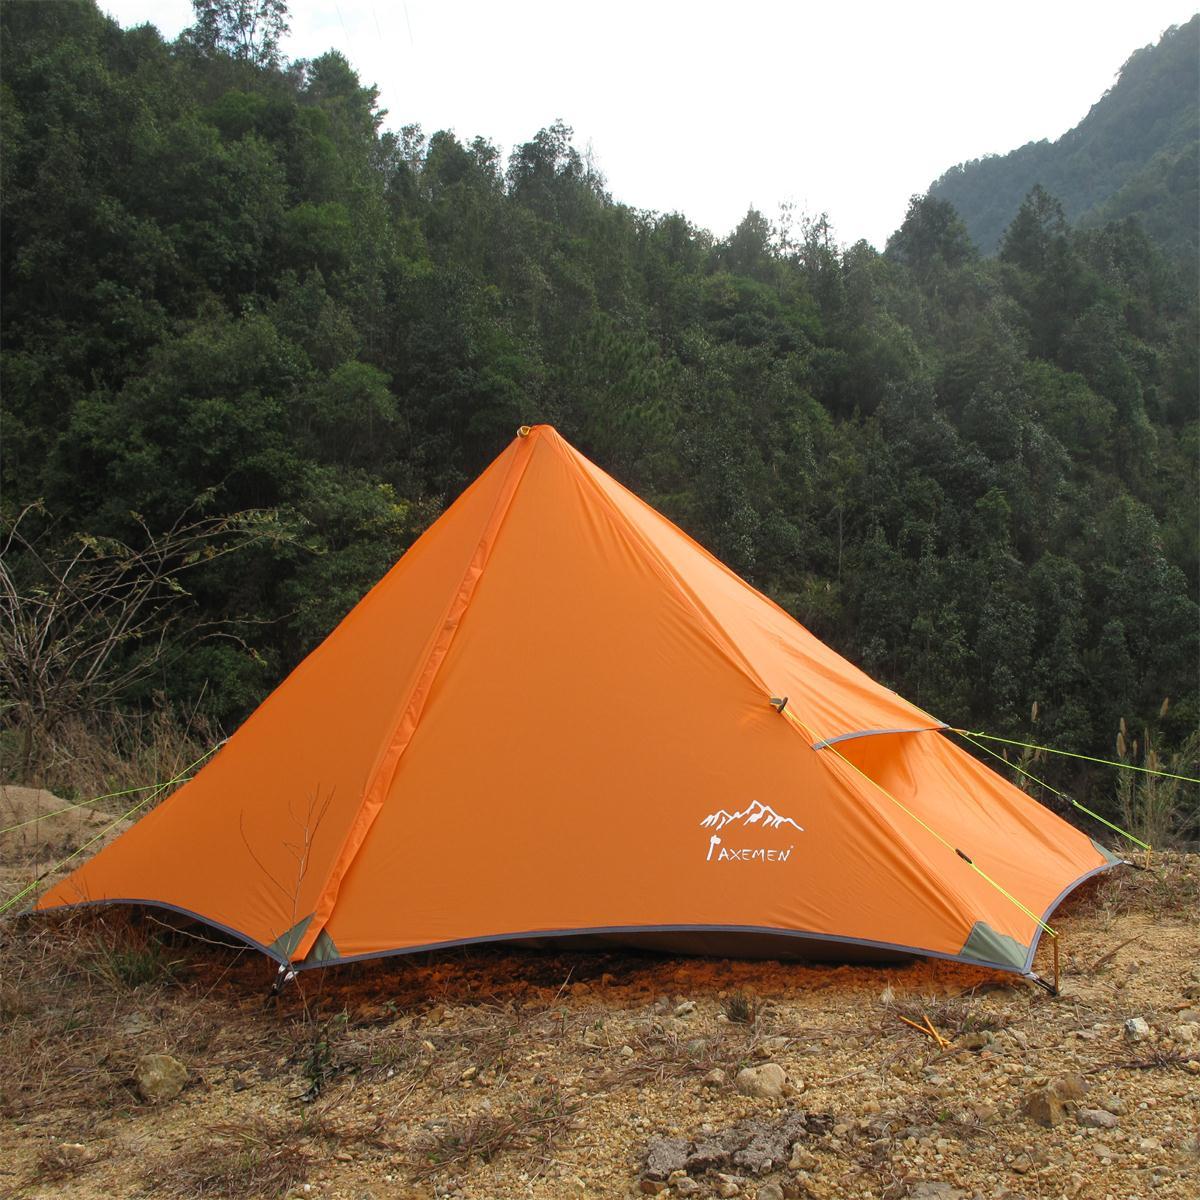 AXEMEN Pyramid super light single rodless mountain tent for four seasons mountain hardwear mountain hardwear ghost ul 2 tent